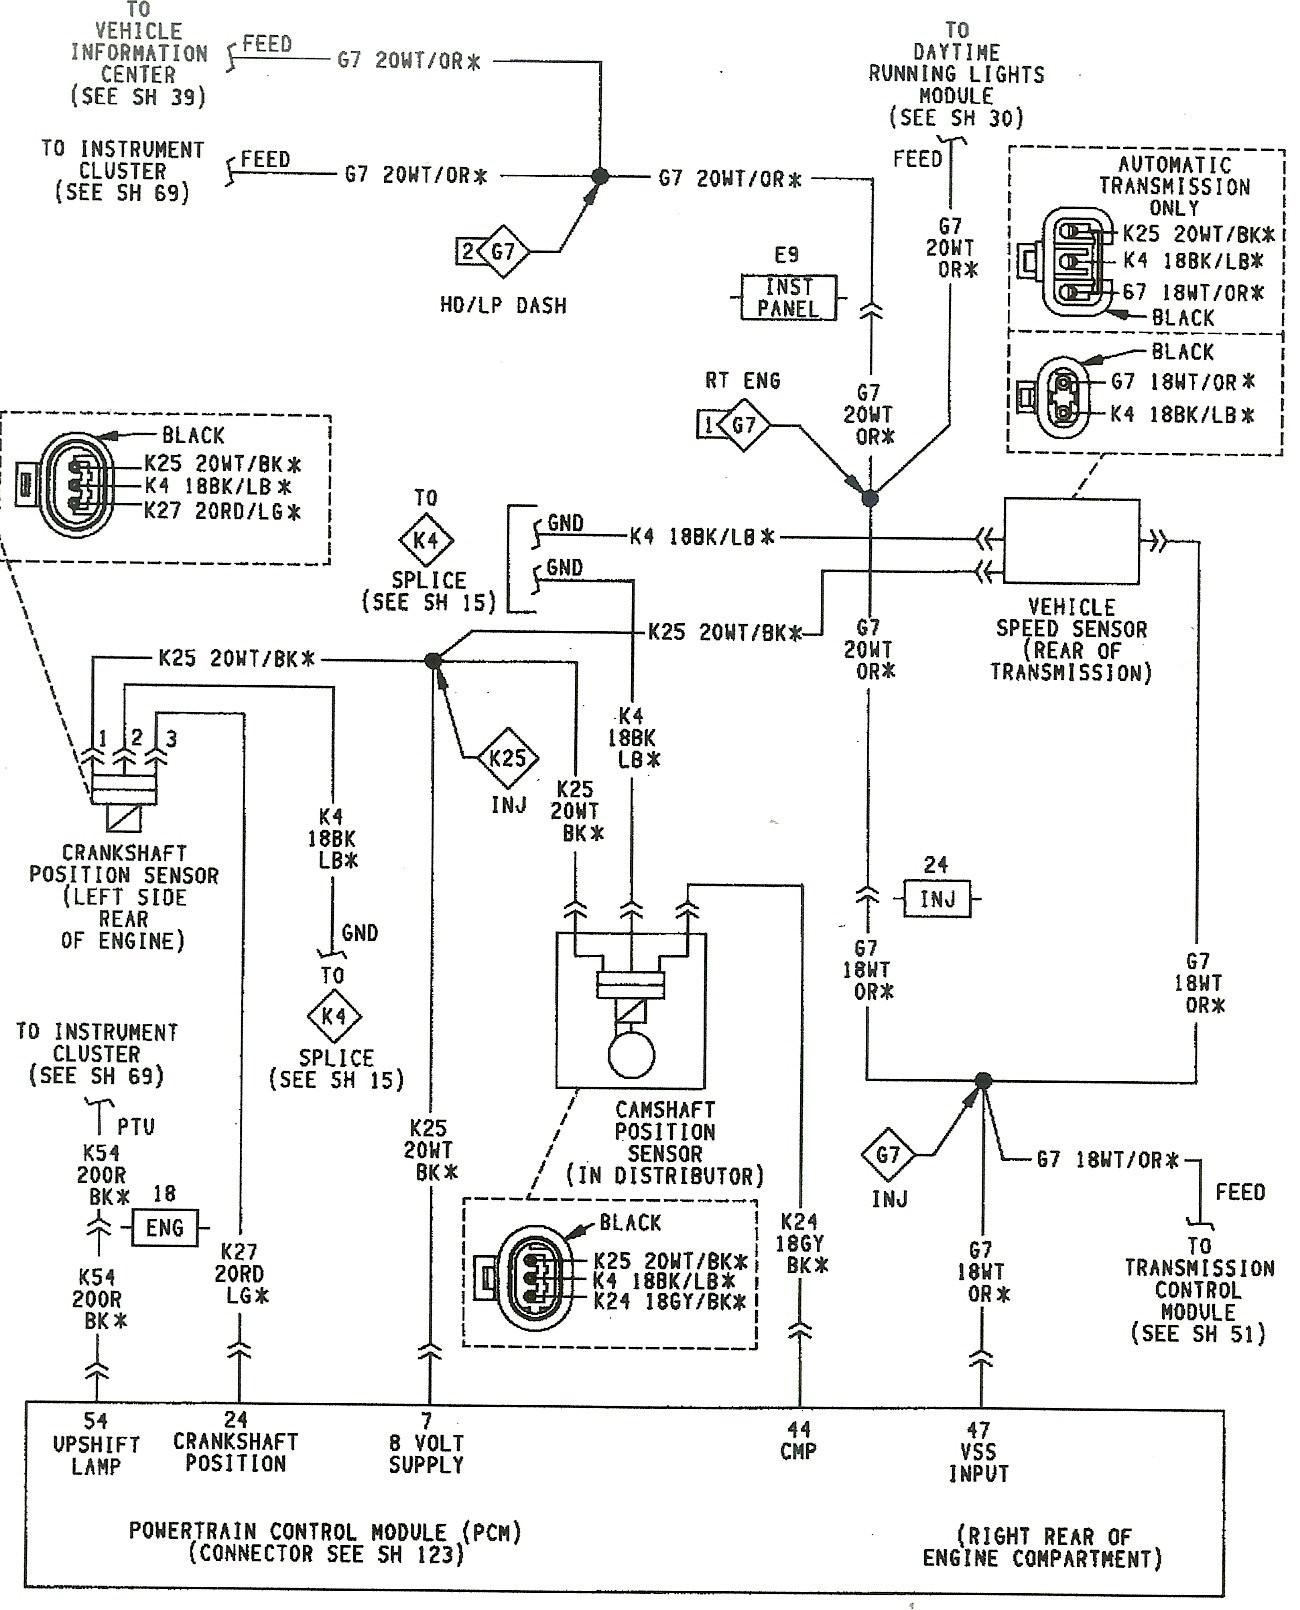 2007 jeep grand cherokee wiring diagram 8 pin usb engine 1992